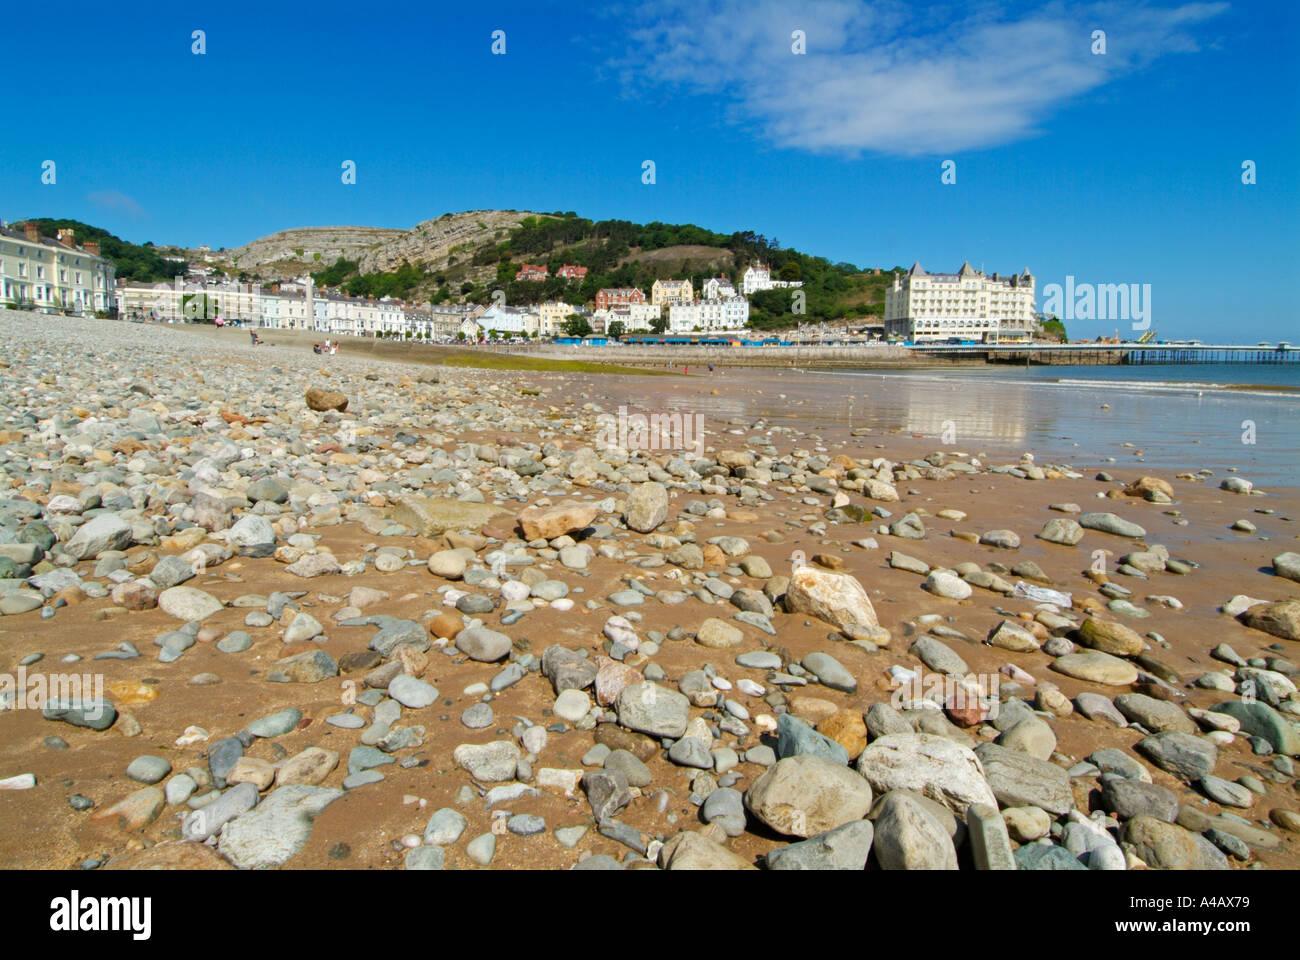 Long Beach With Pier And Grand Hotel At Llandudno Bay North Wales Uk Stock Photo Alamy